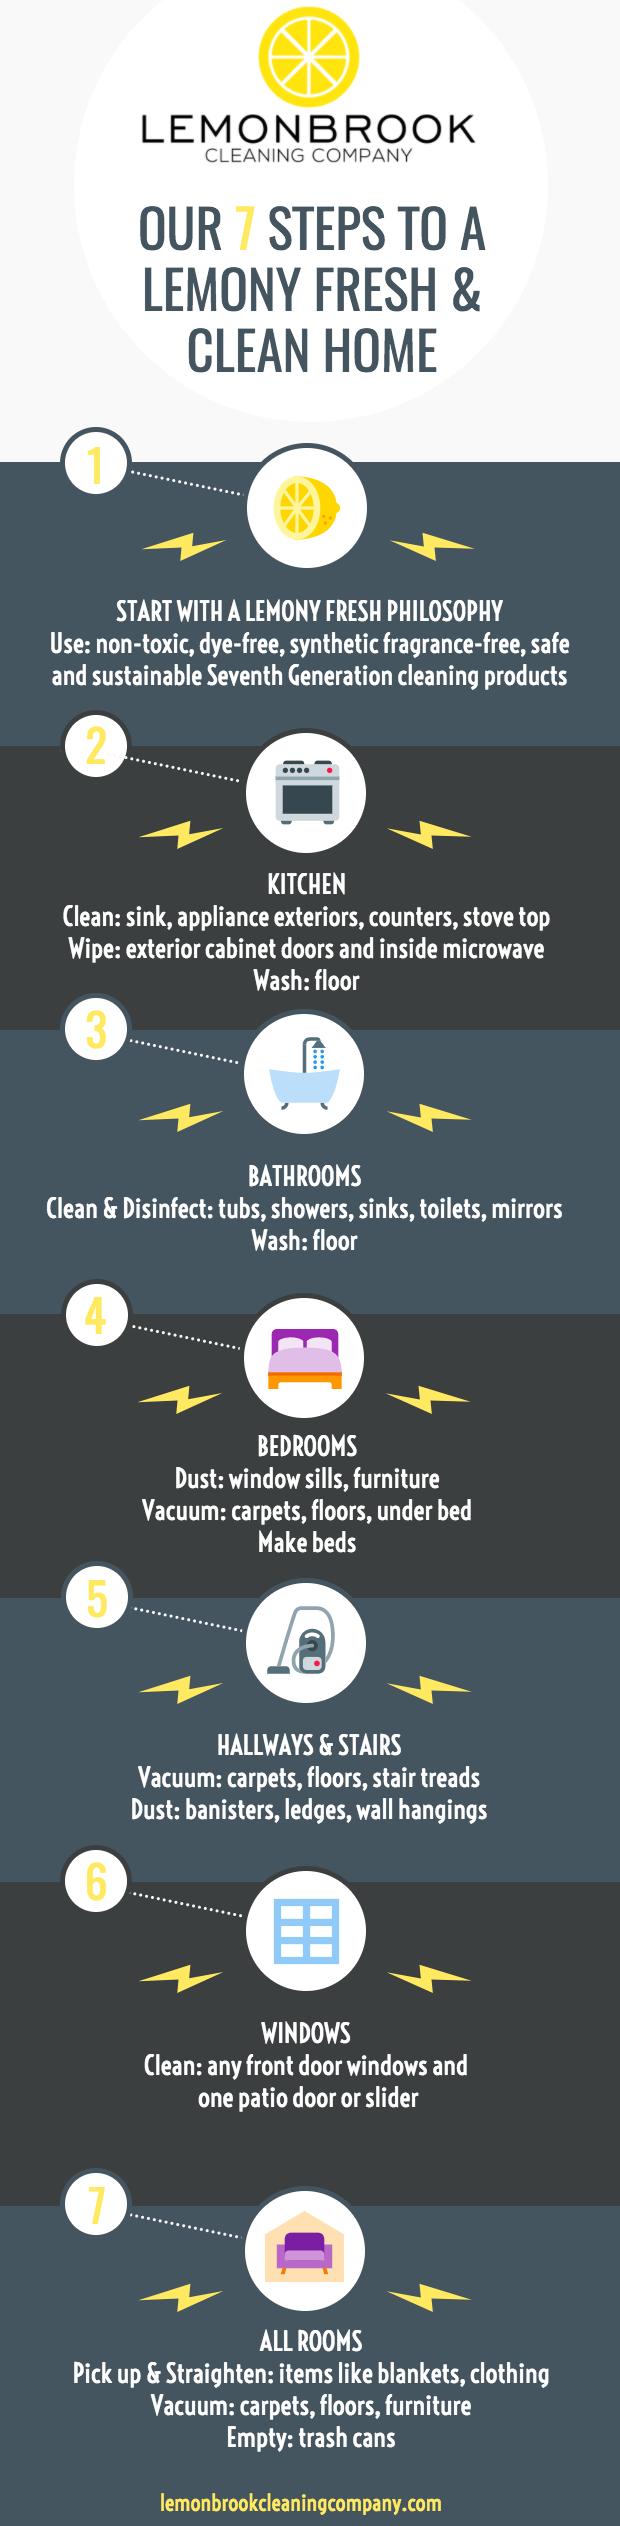 7 Steps to a Lemony Fresh and Clean Home